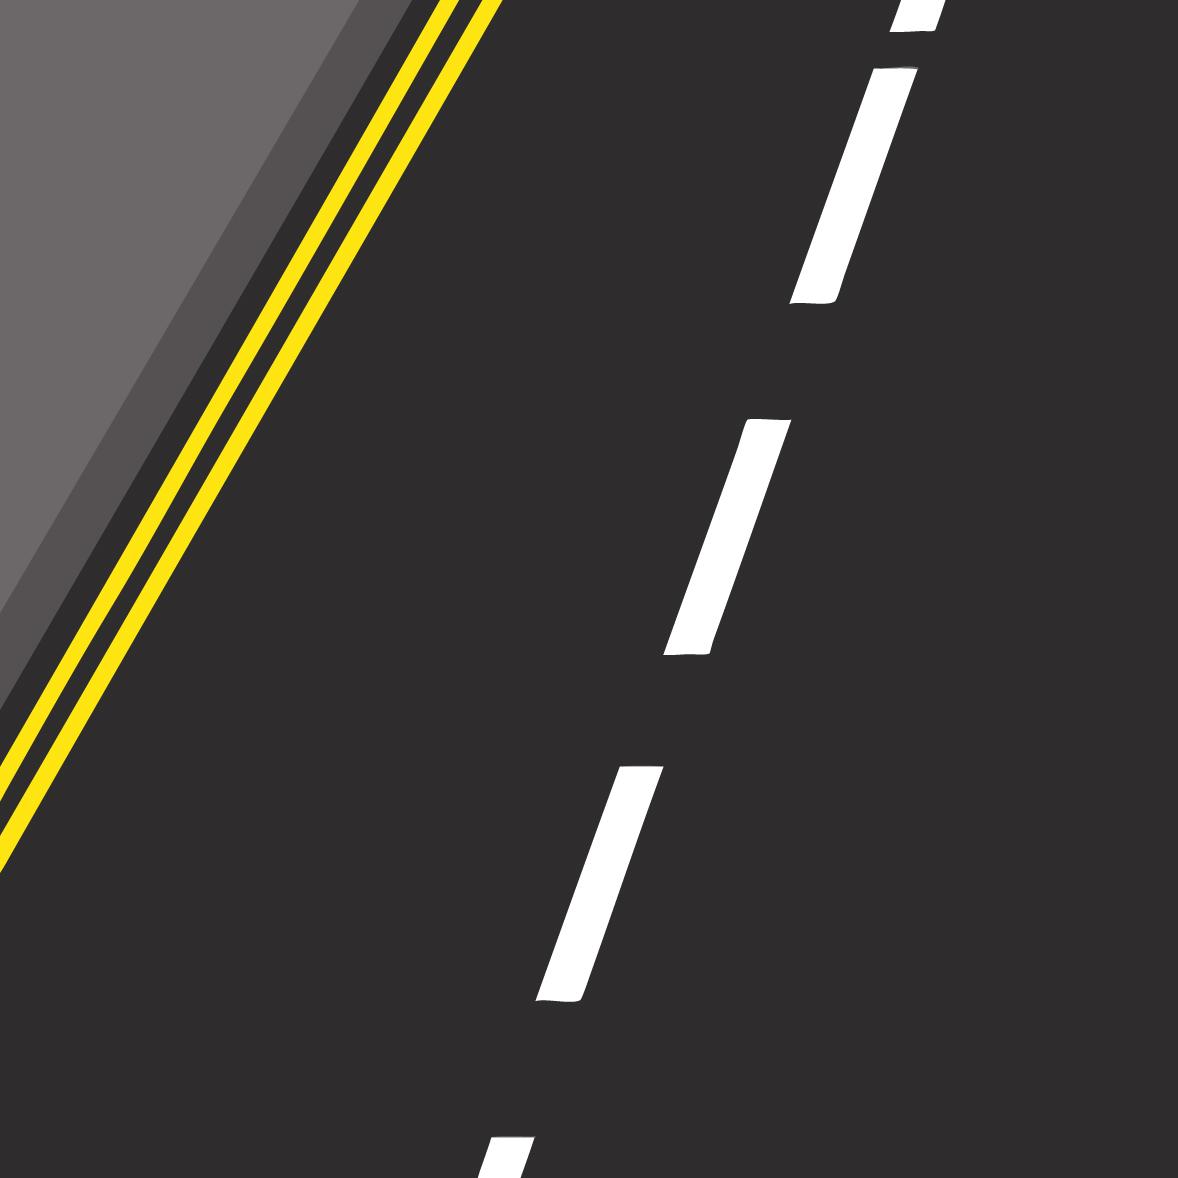 double yellow lines